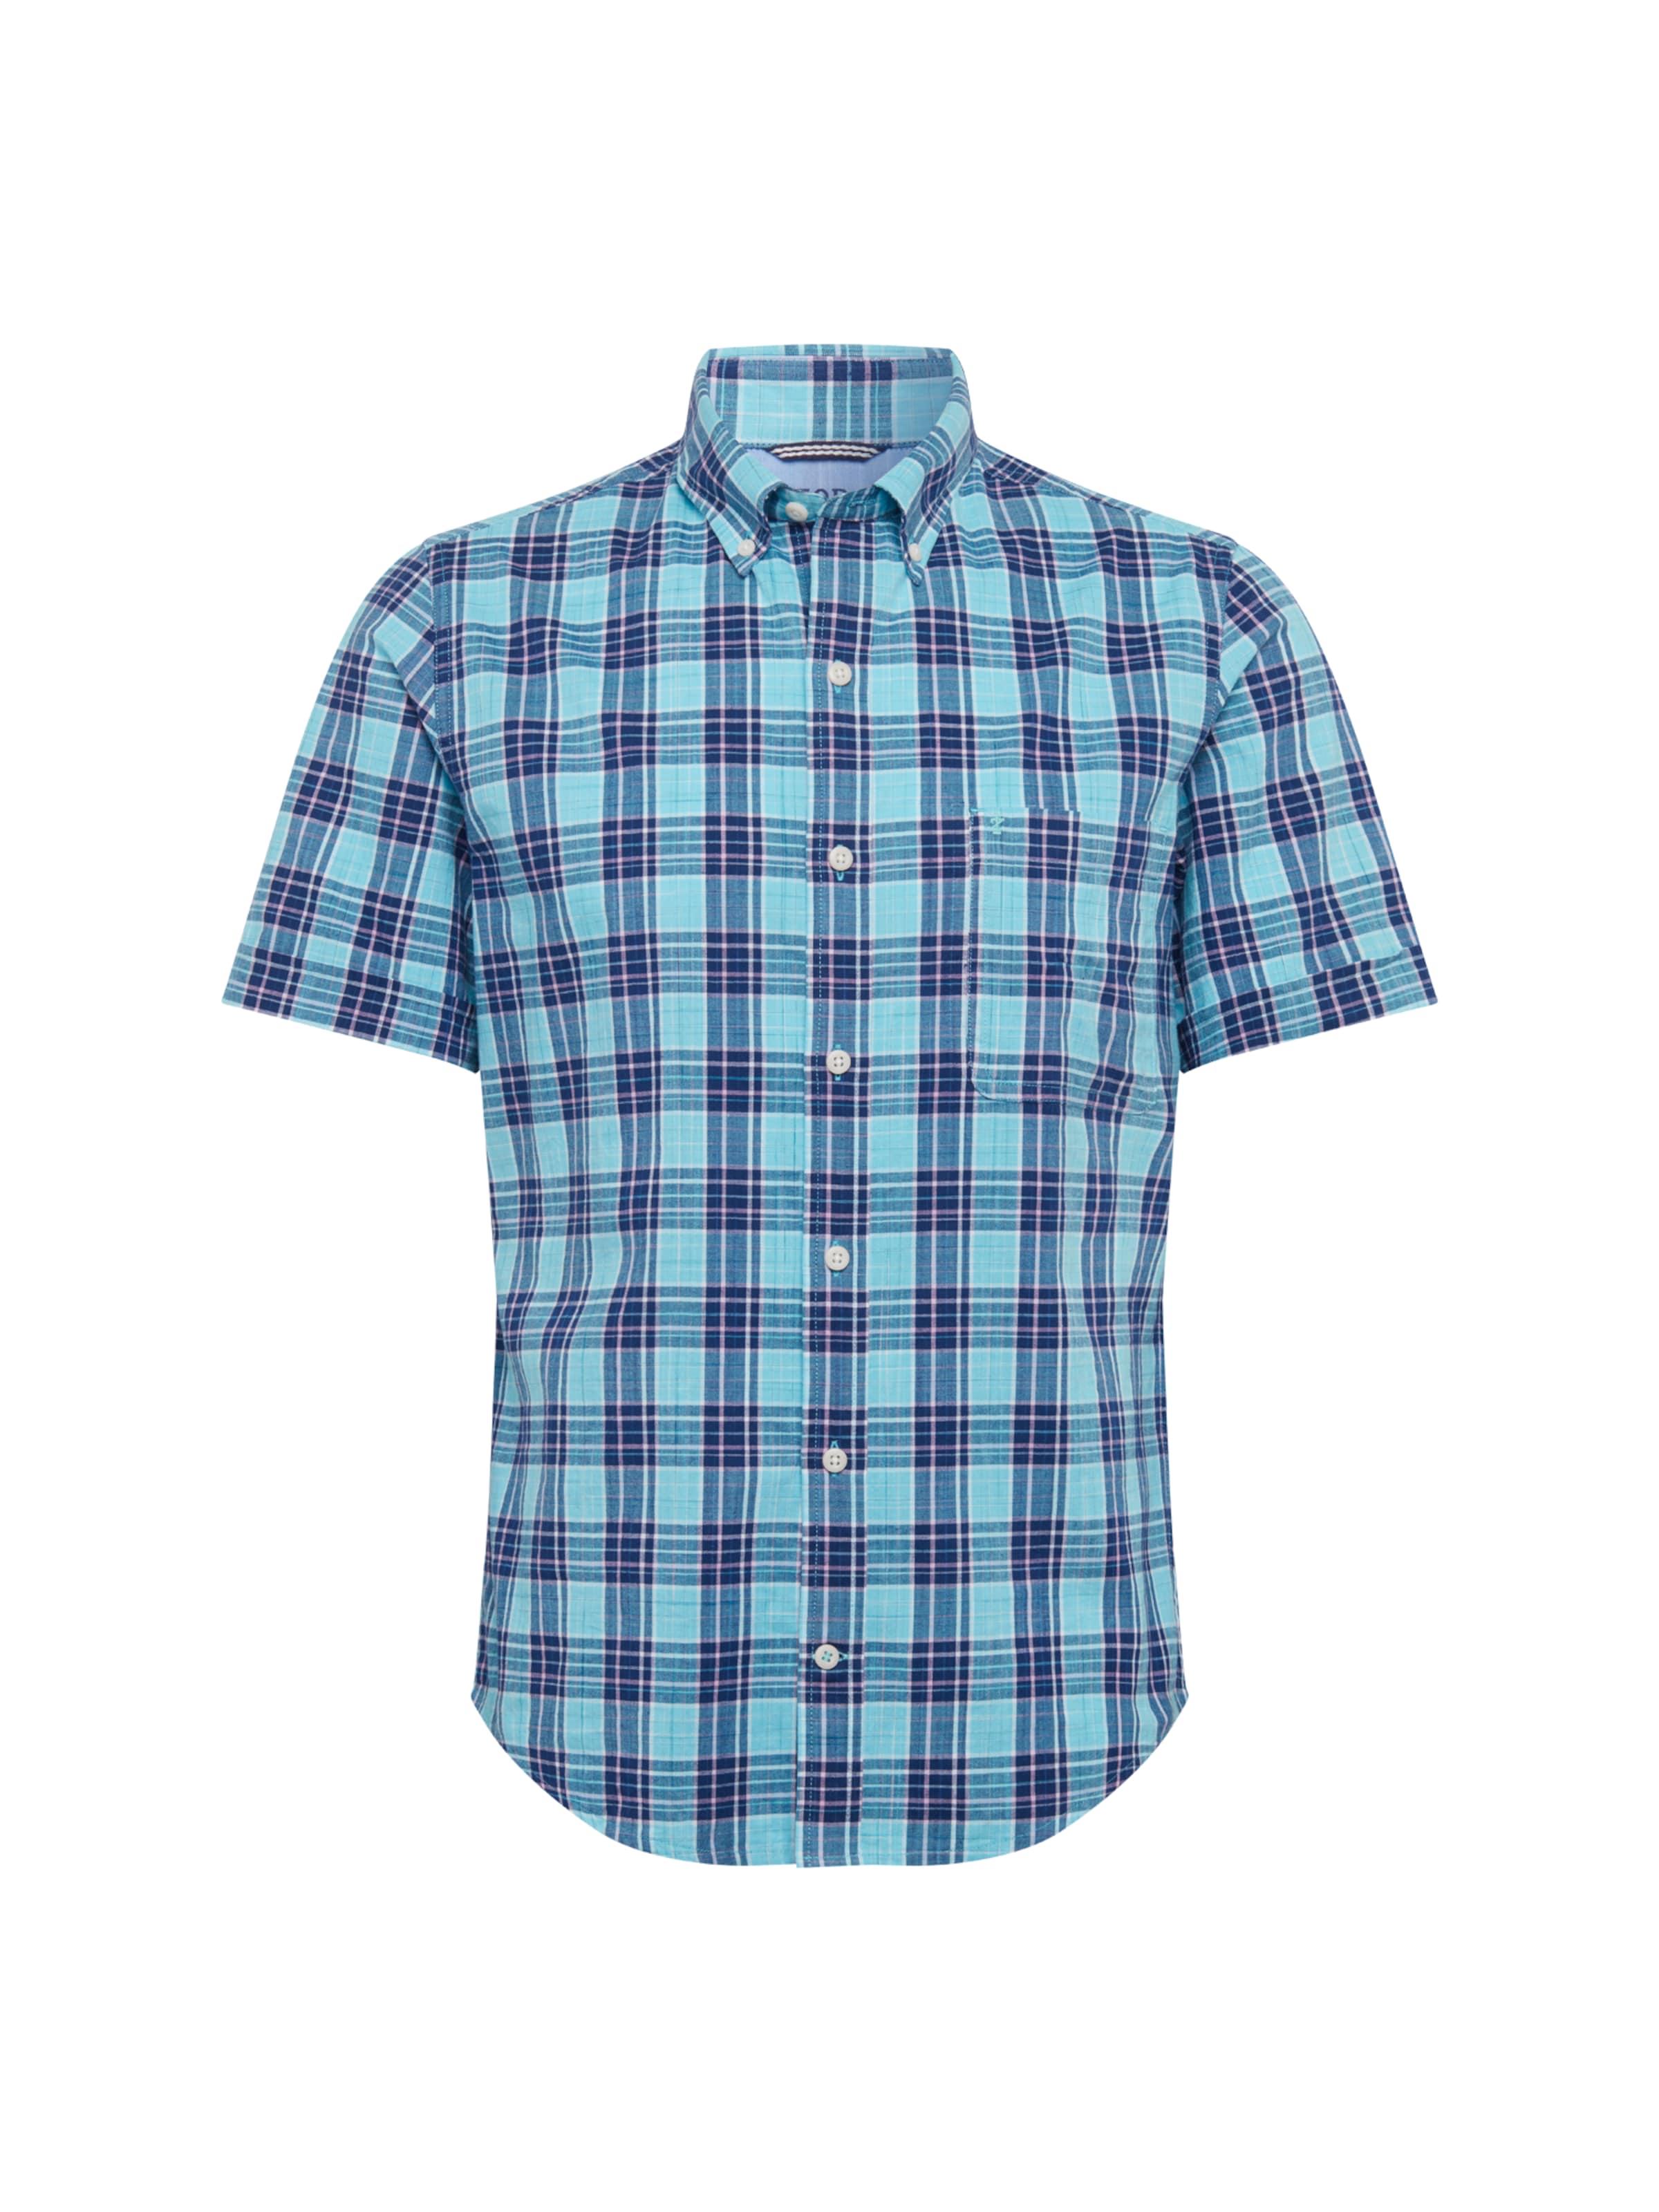 Ss Chemise Chambray En Bleu Izod 'dockside Plaid Shirt' l1JcuFKT3